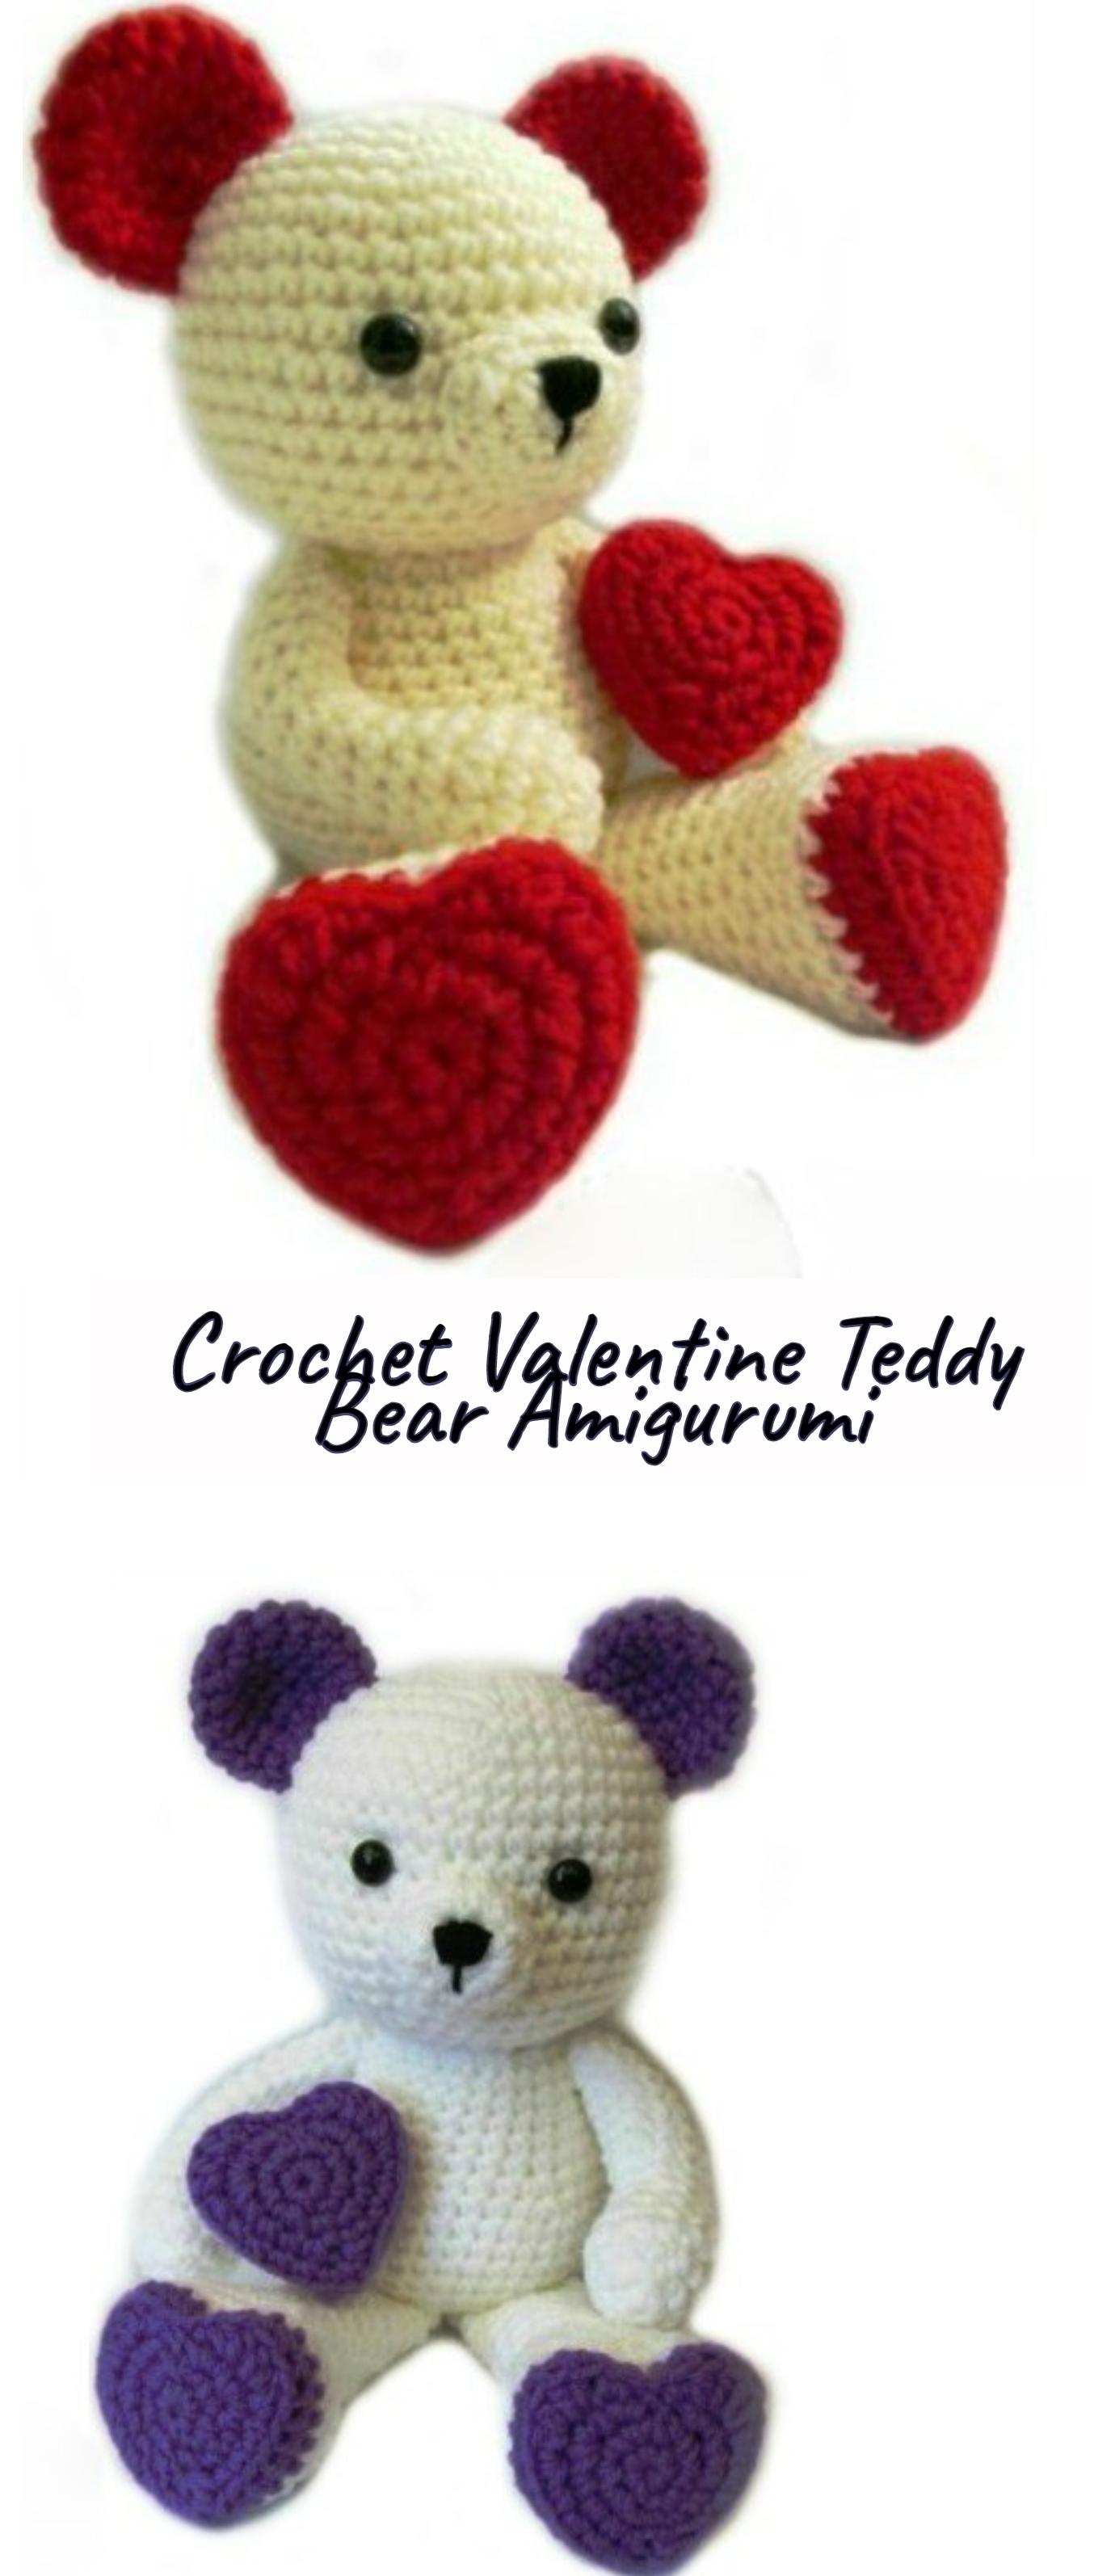 Crochet-Valentine-Teddy-Bear-Amigurumi